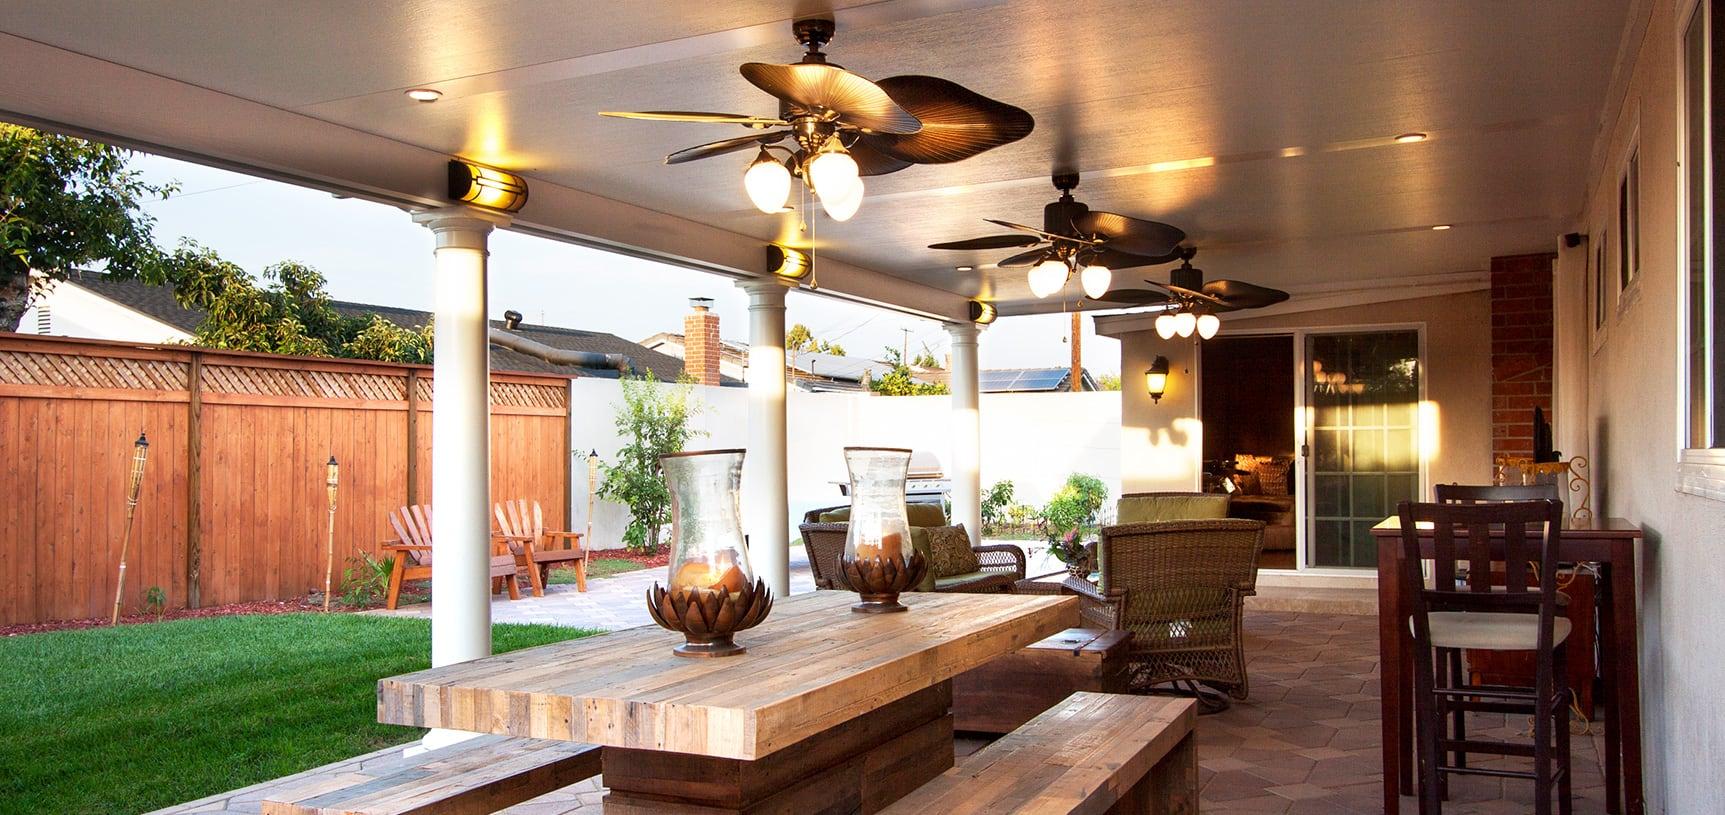 ideas for aluminum patio covers